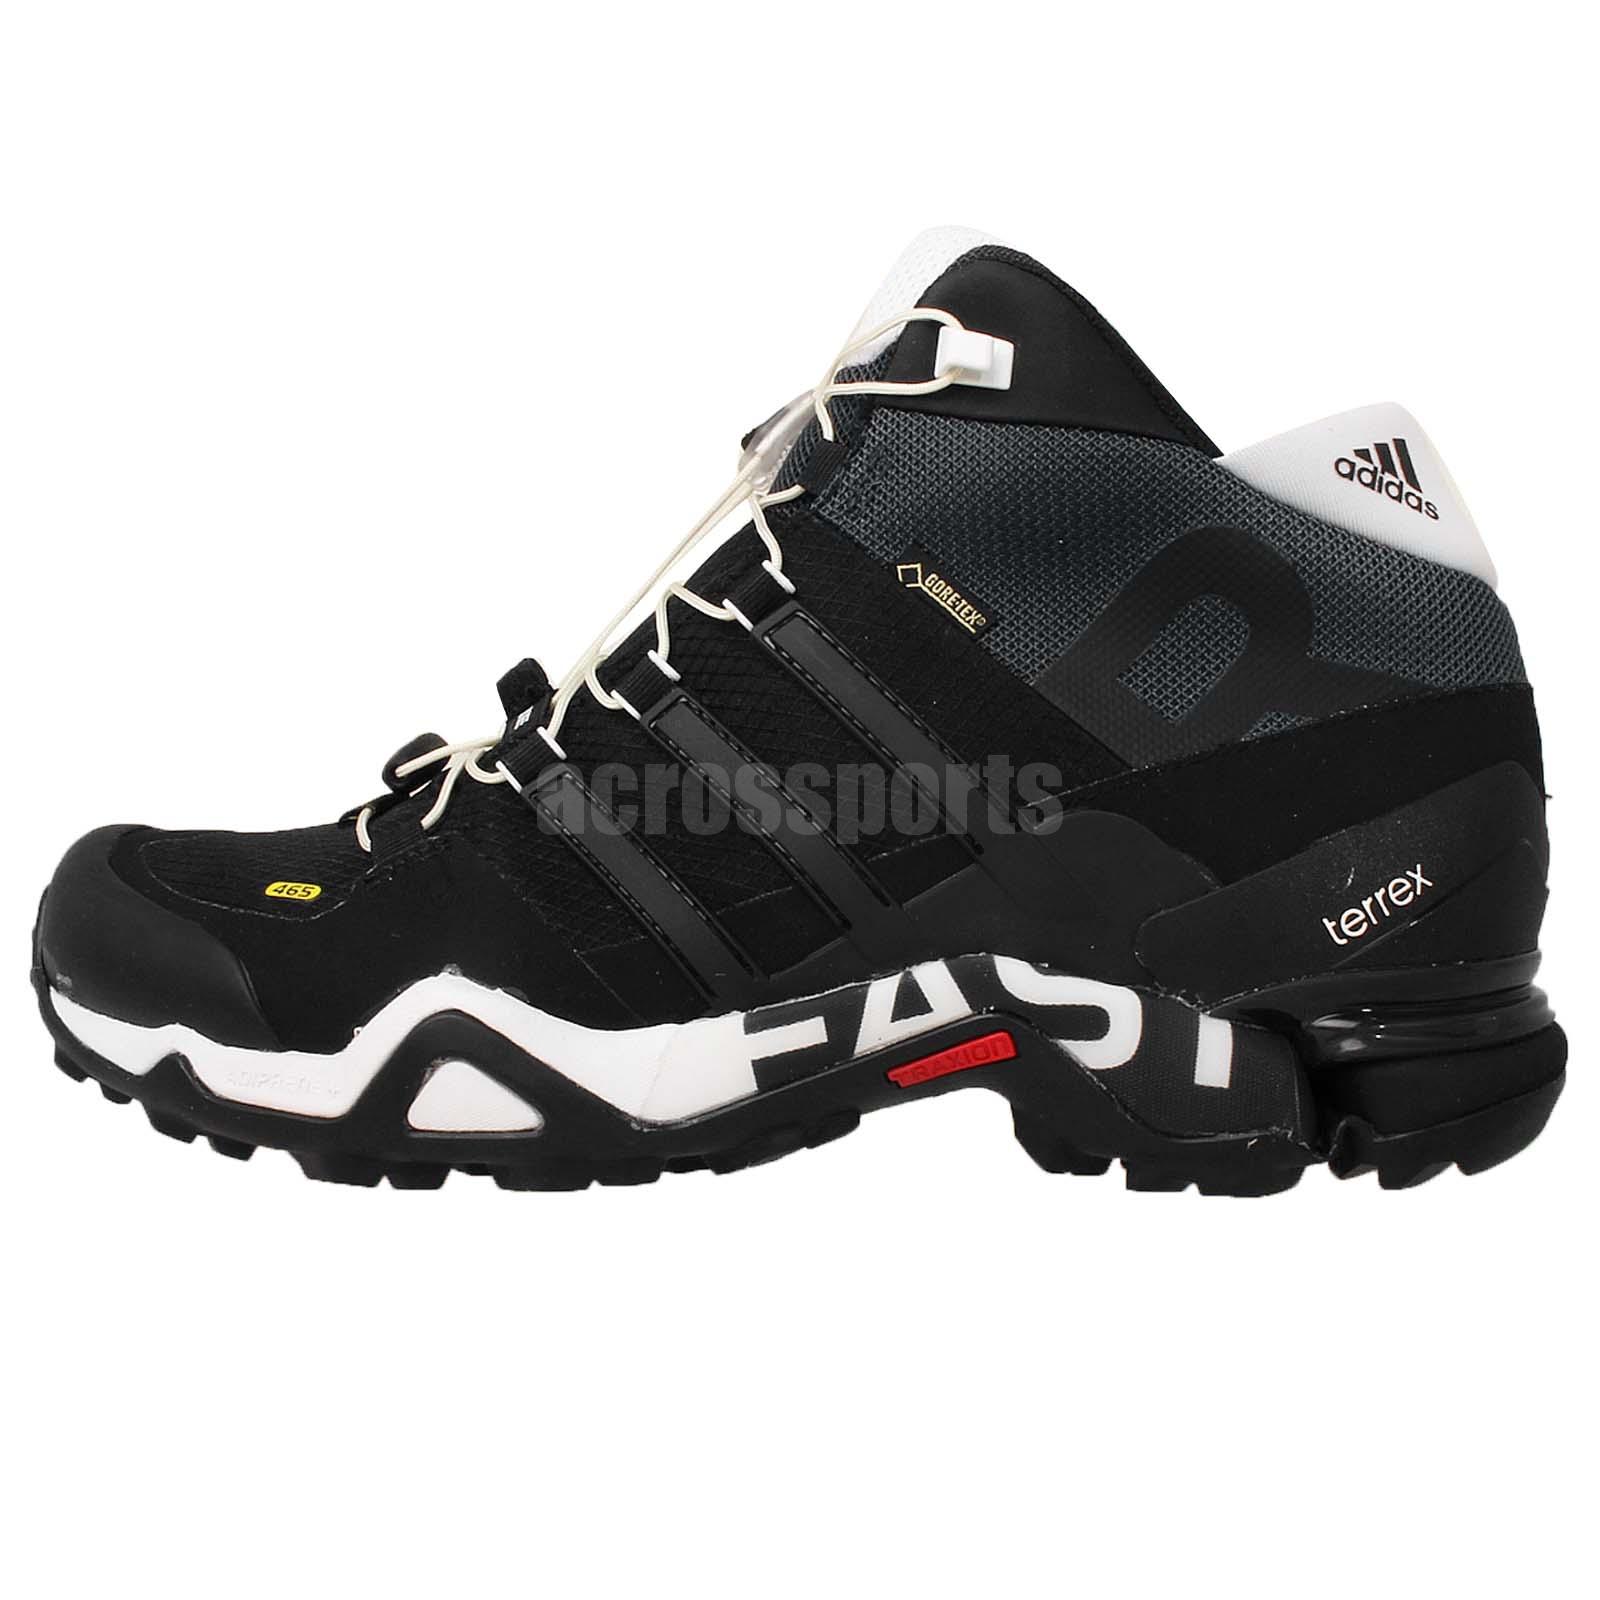 adidas terrex fast r mid gtx gore tex black 2015 mens outdoors hiking shoes ebay. Black Bedroom Furniture Sets. Home Design Ideas